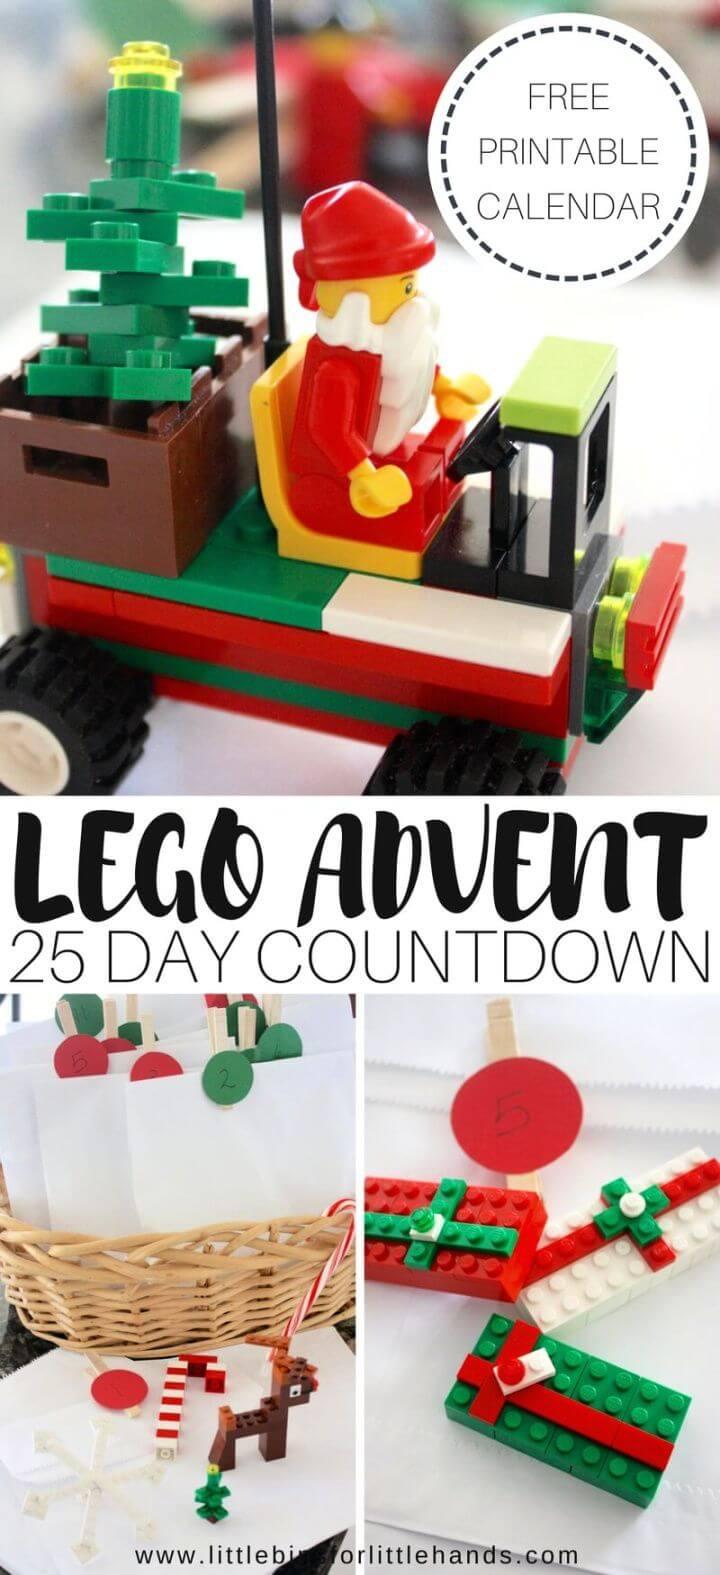 Make Your Own DIY Lego Advent Calendar